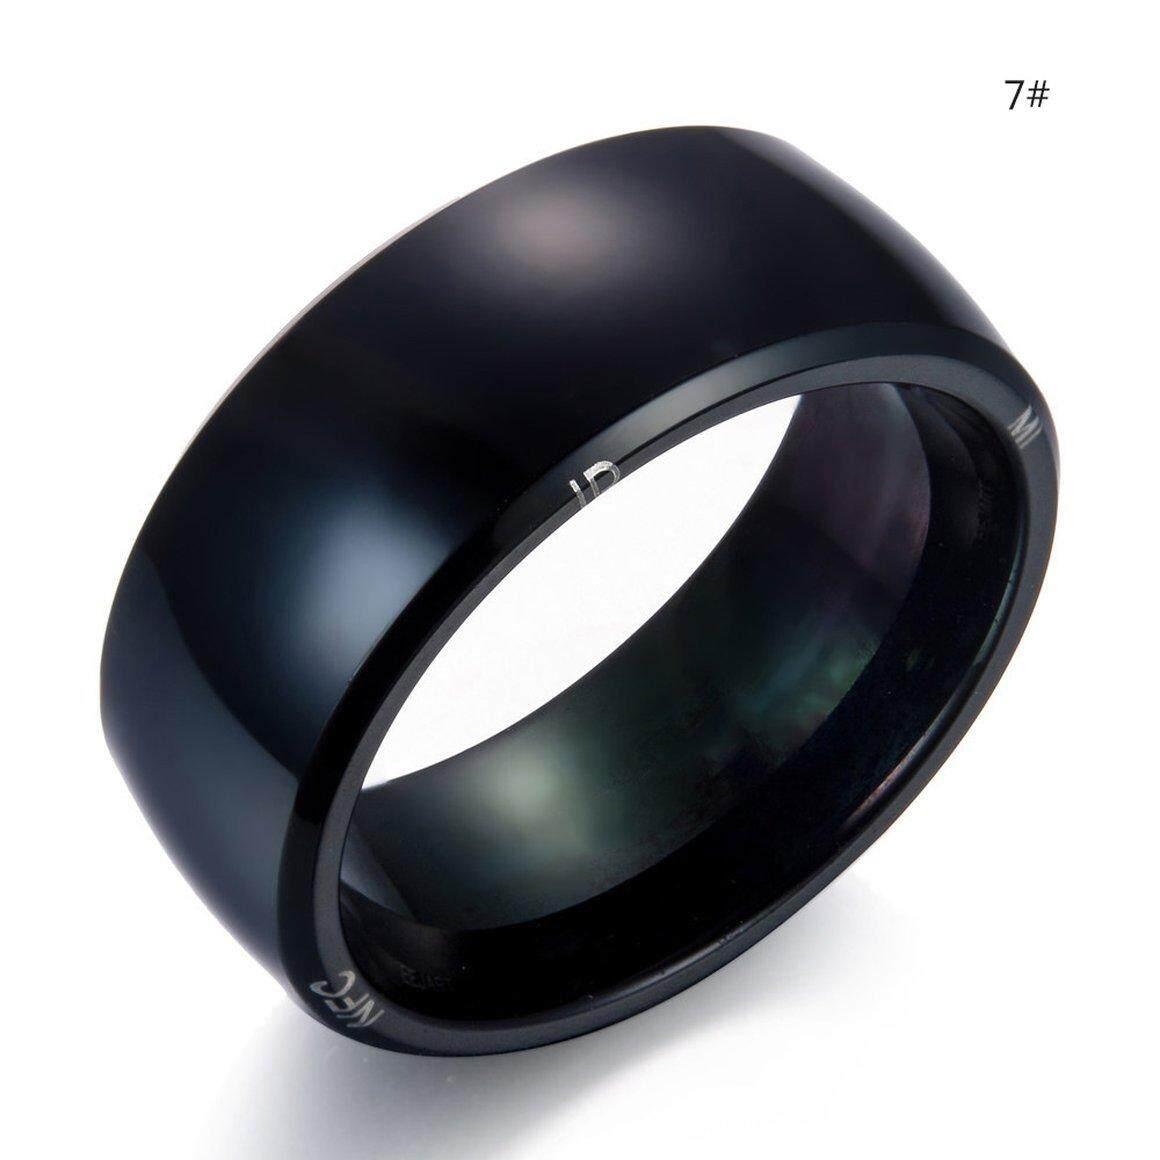 WOND Fashionable Design Smart Ring Wearable Device NFC Magic Ring Waterproof